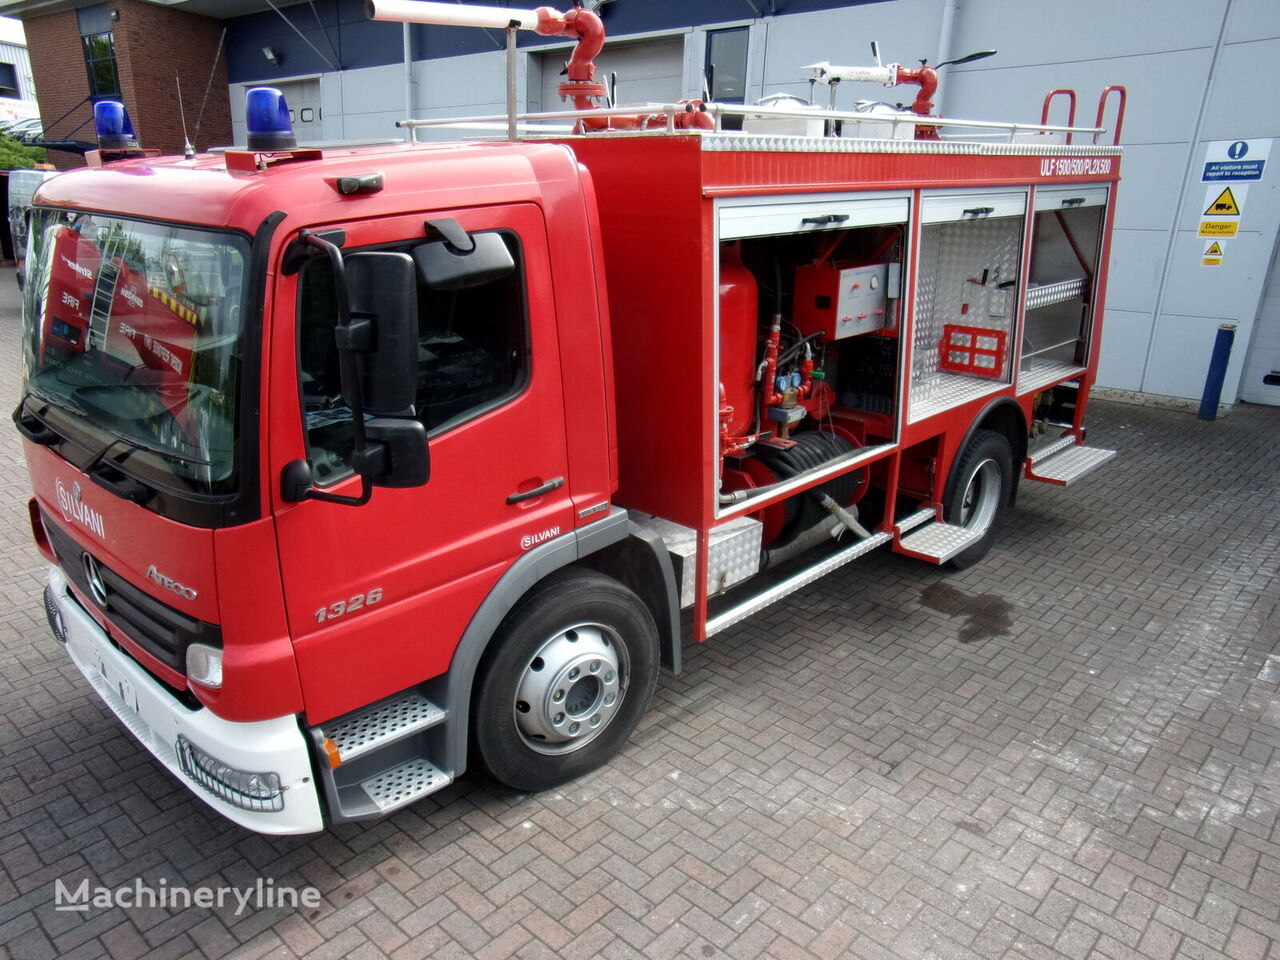 new MERCEDES-BENZ Atego 1326 fire truck